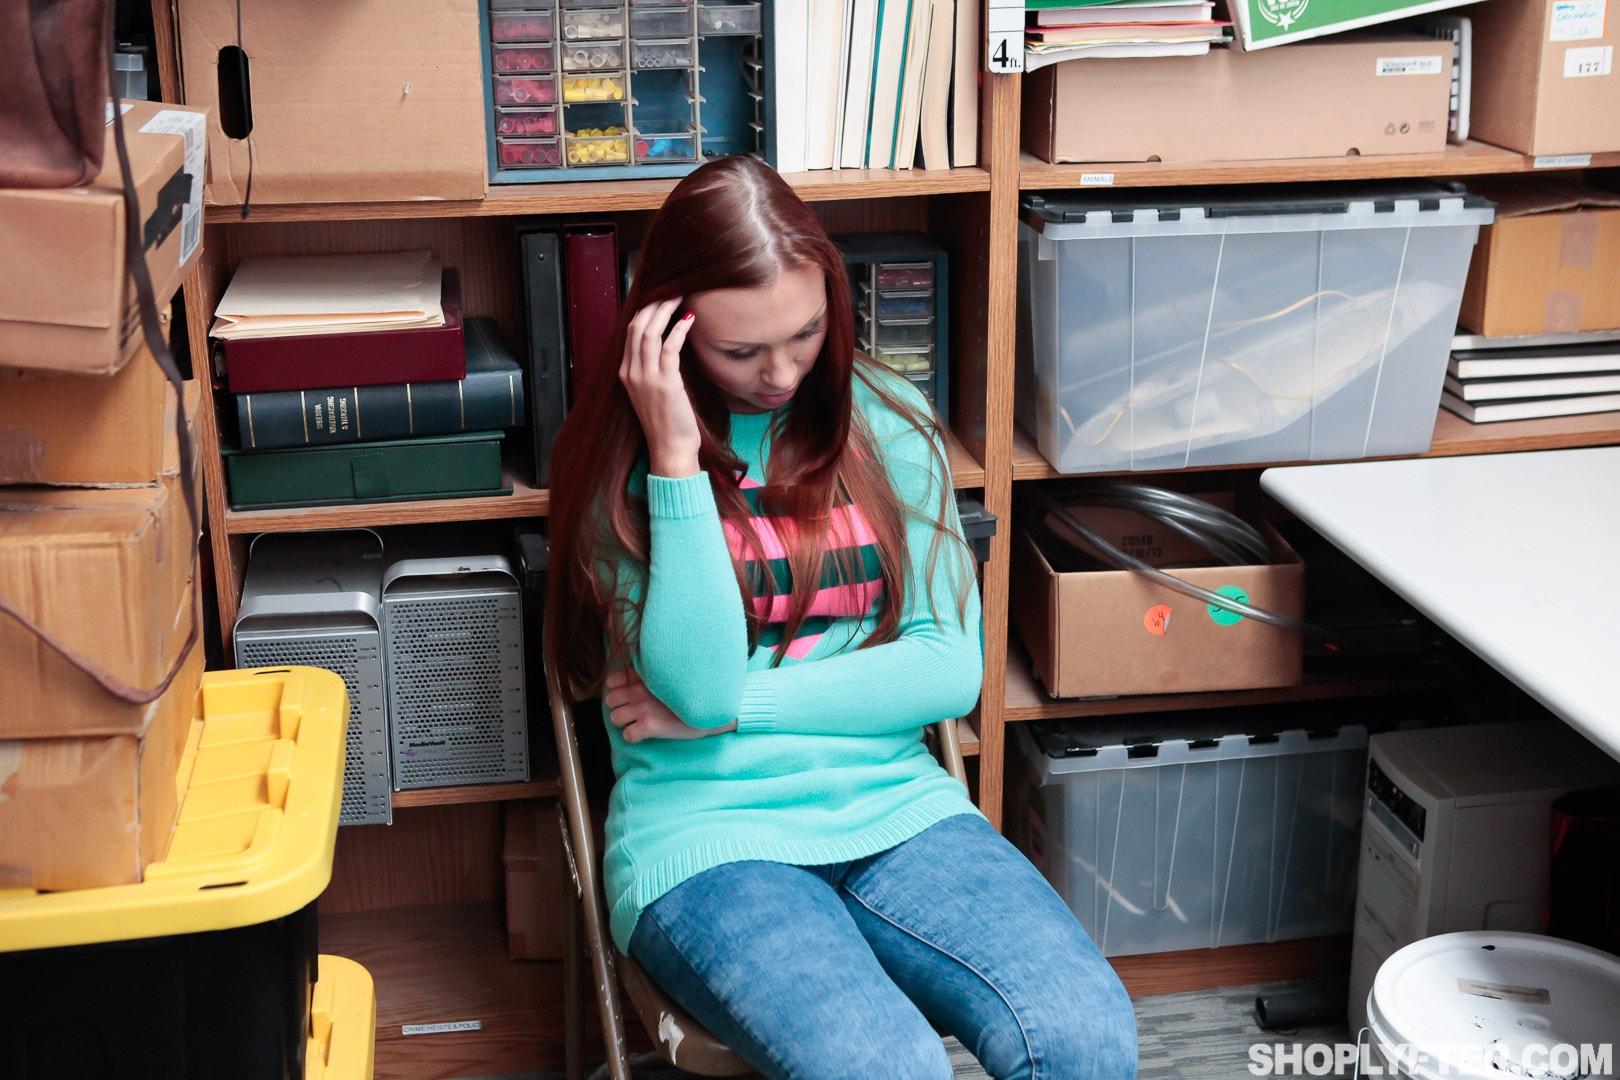 Team Skeet 'Case No. 3635587' starring Ornella Morgan (Photo 2)